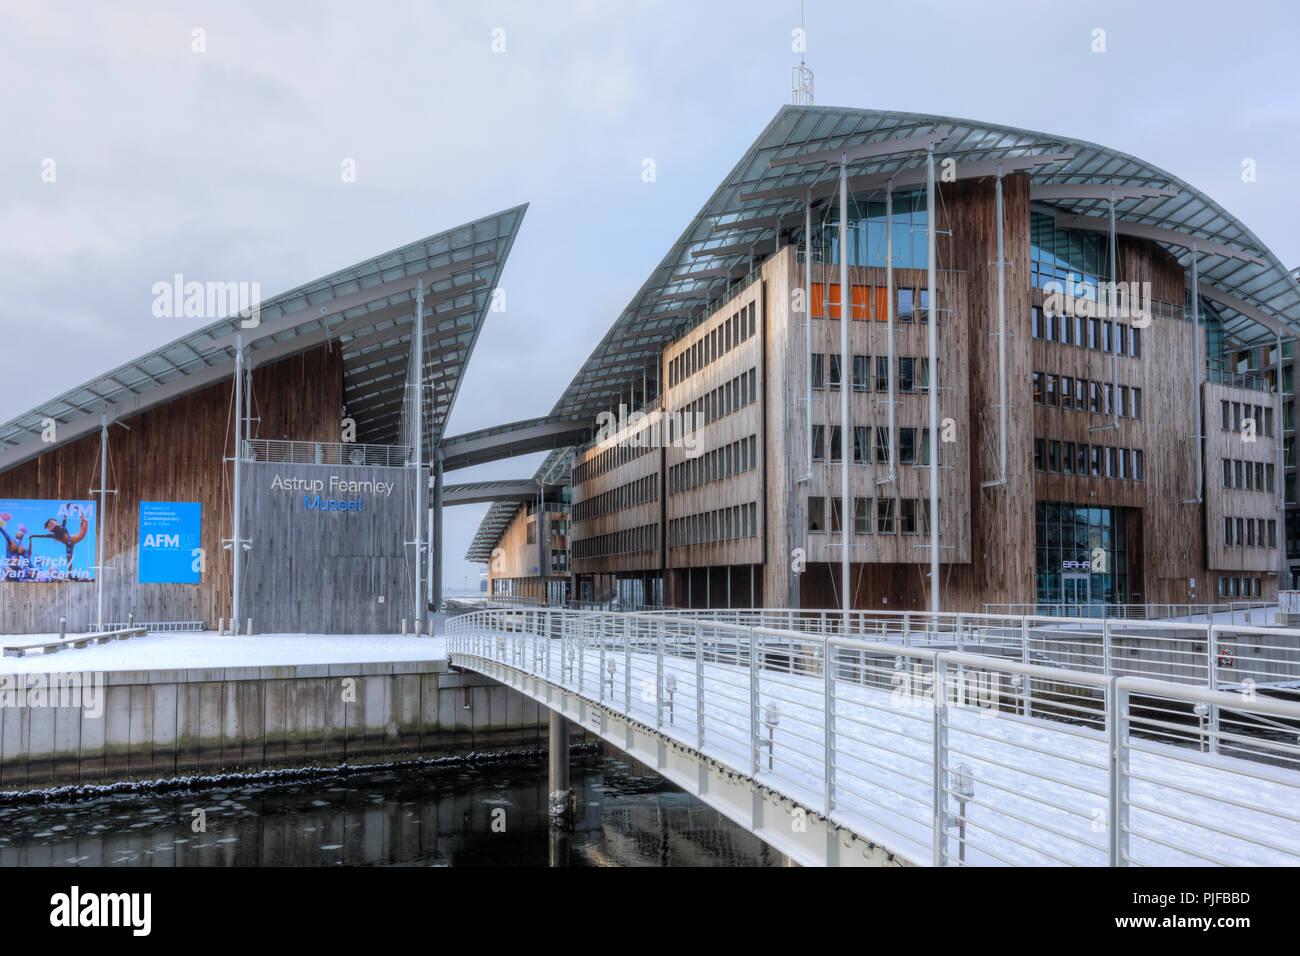 Oslo, Aker Brygge, Norway, Europe - Stock Image